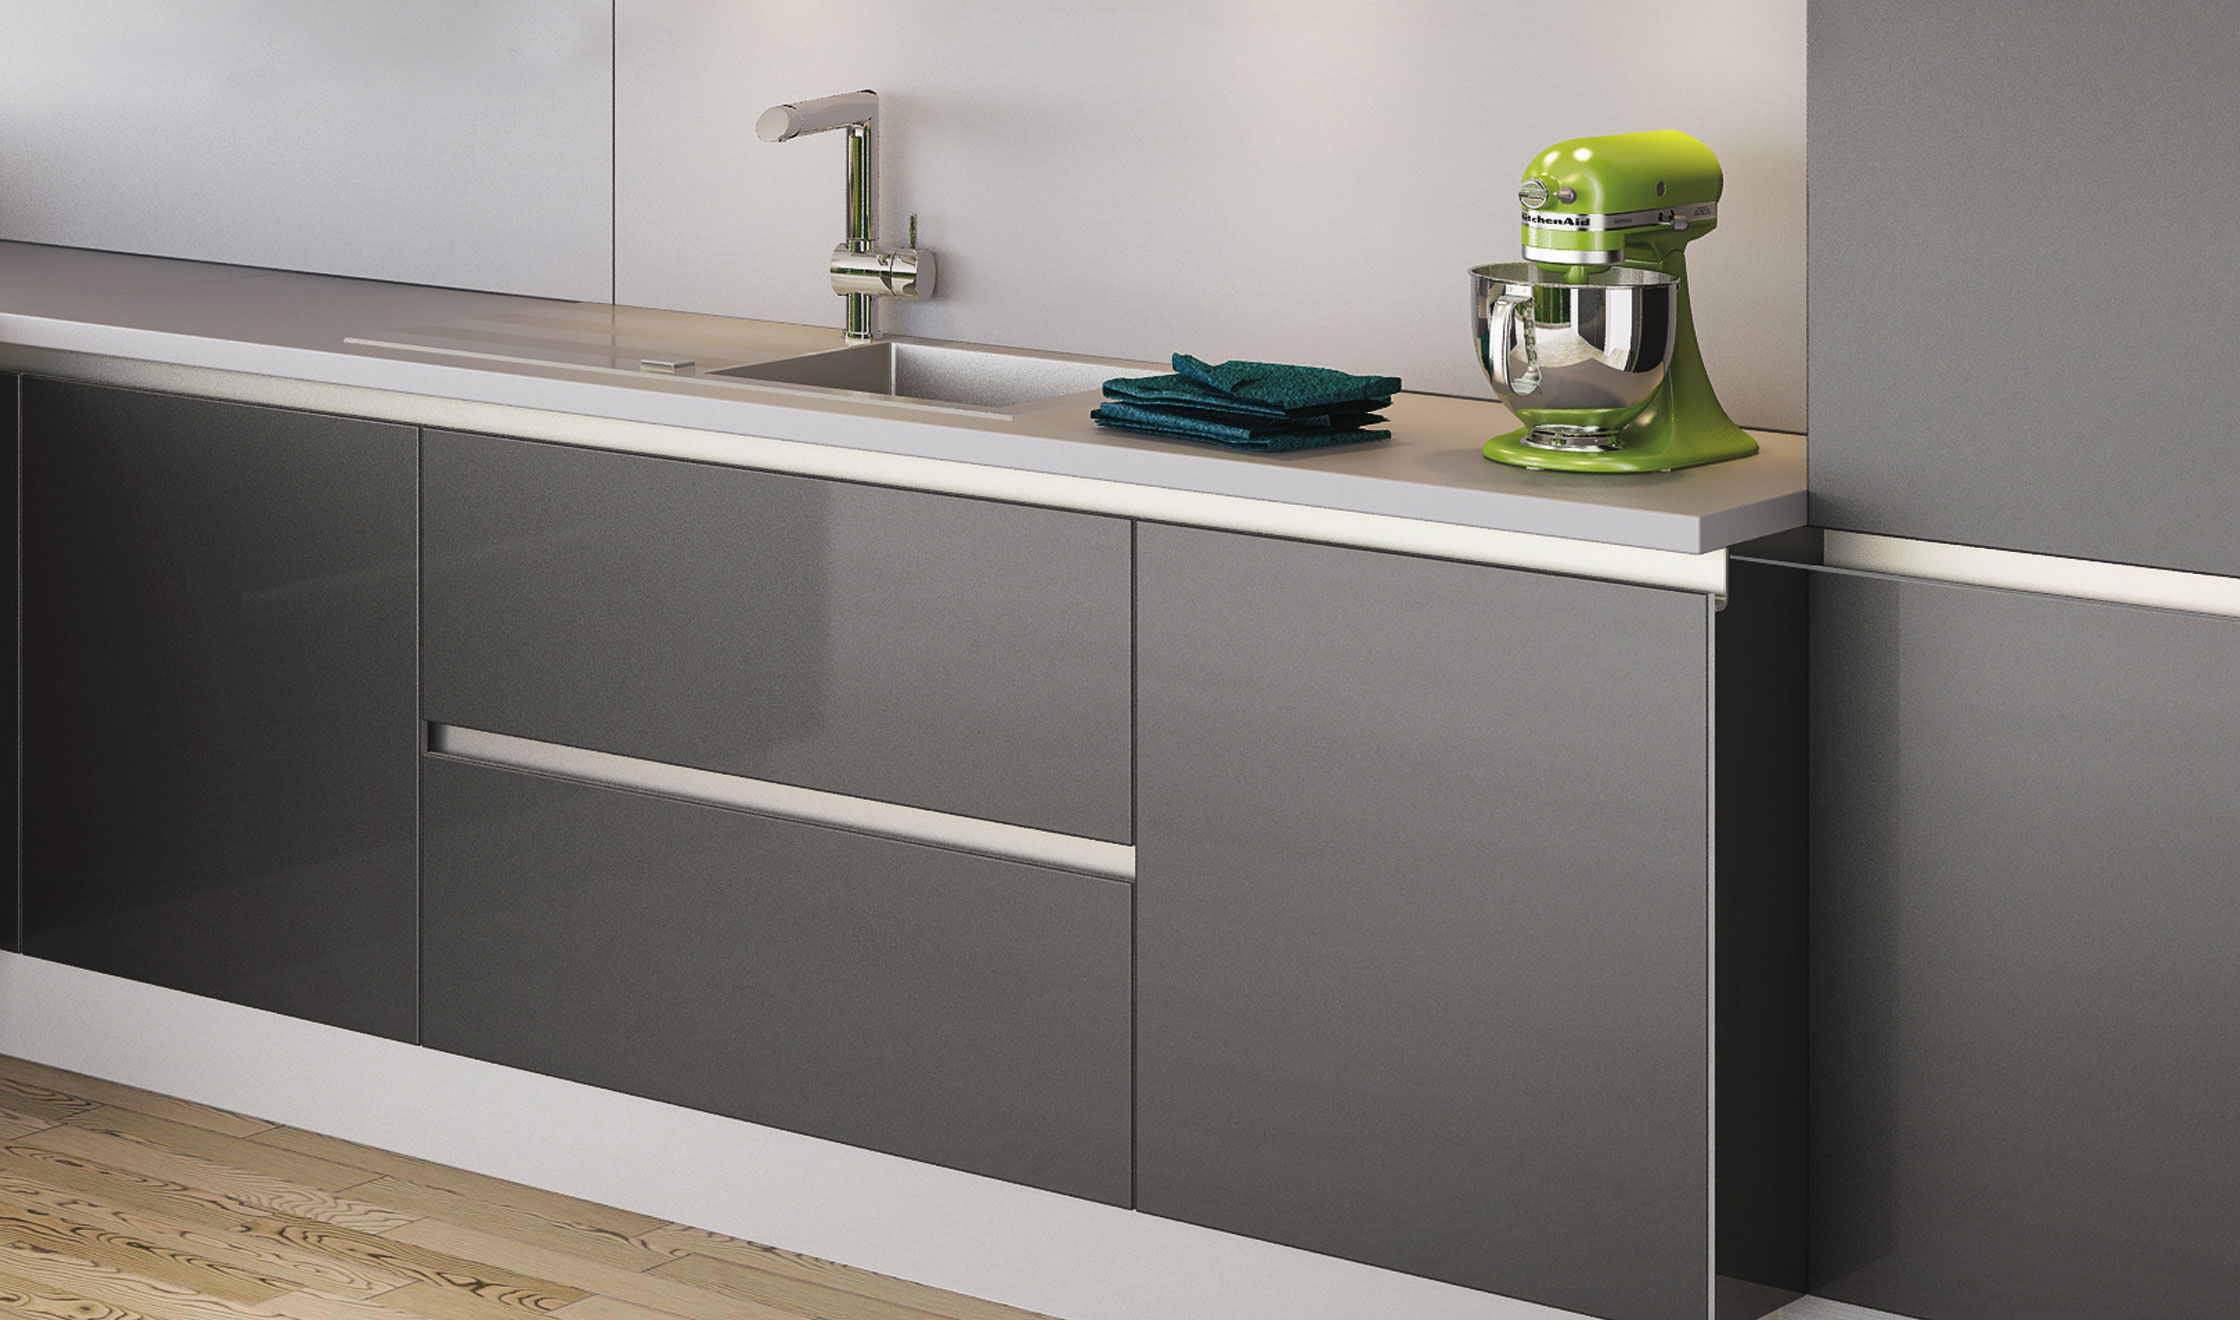 crdence acrylique cuisine credence rouge cormeilles crdence wici bati acrylique crdence. Black Bedroom Furniture Sets. Home Design Ideas